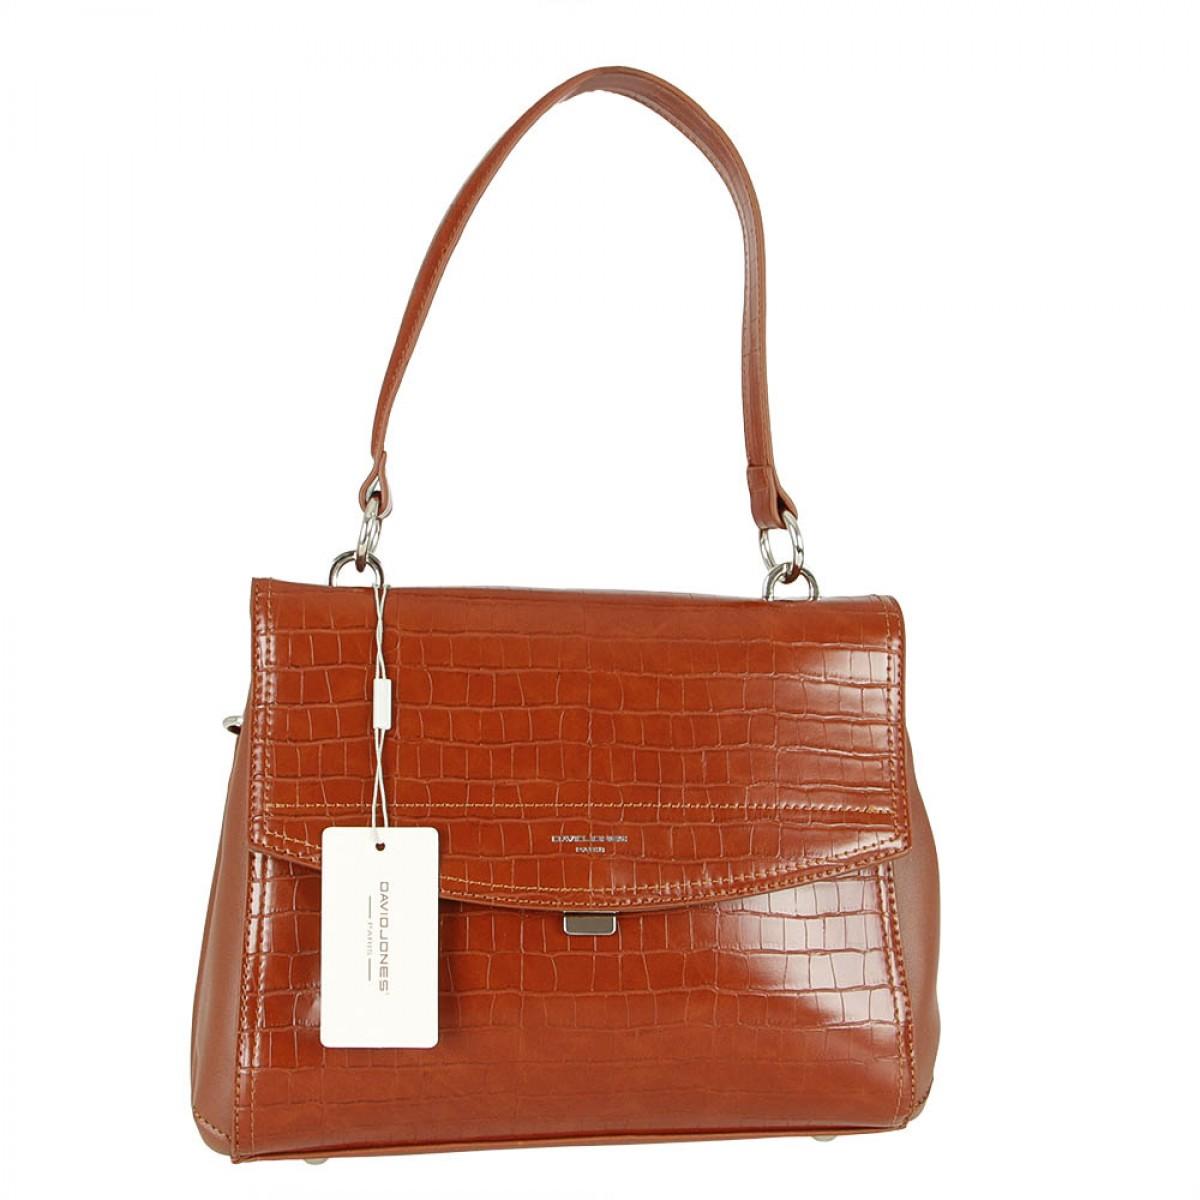 Жіноча сумка David Jones 6148-2 BROWN